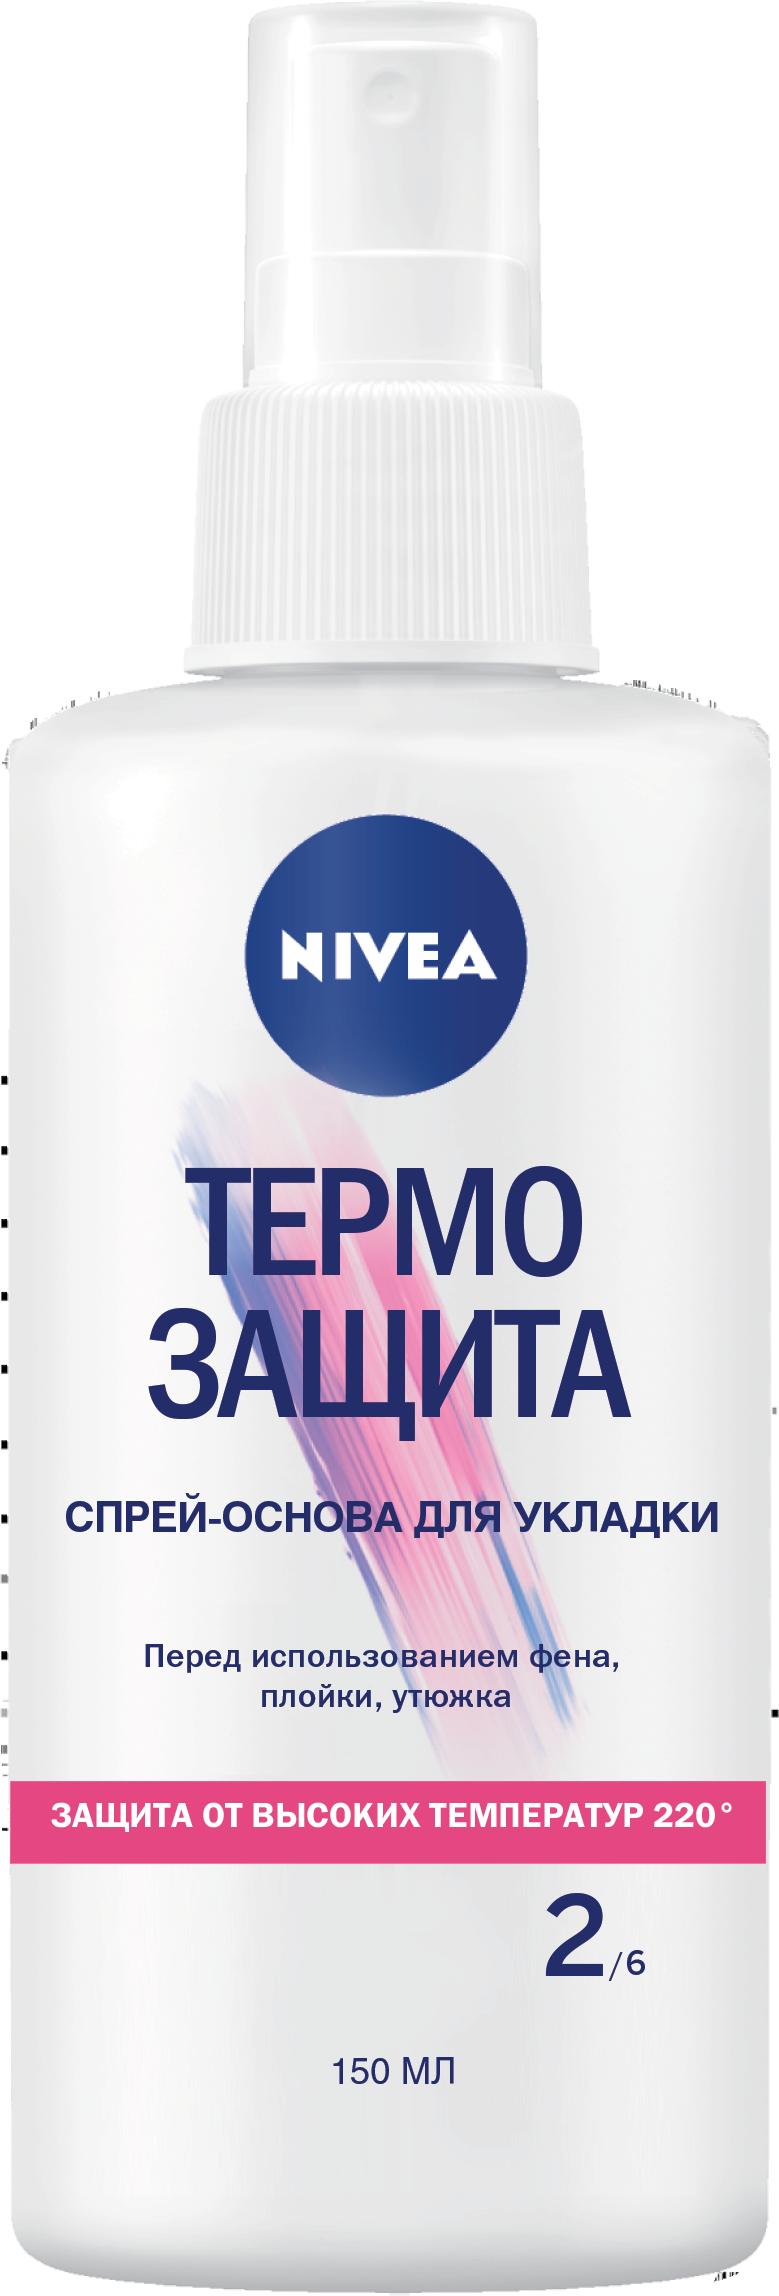 Лак для укладки волос NIVEA ТЕРМО ЗАЩИТА 88629 150 мл